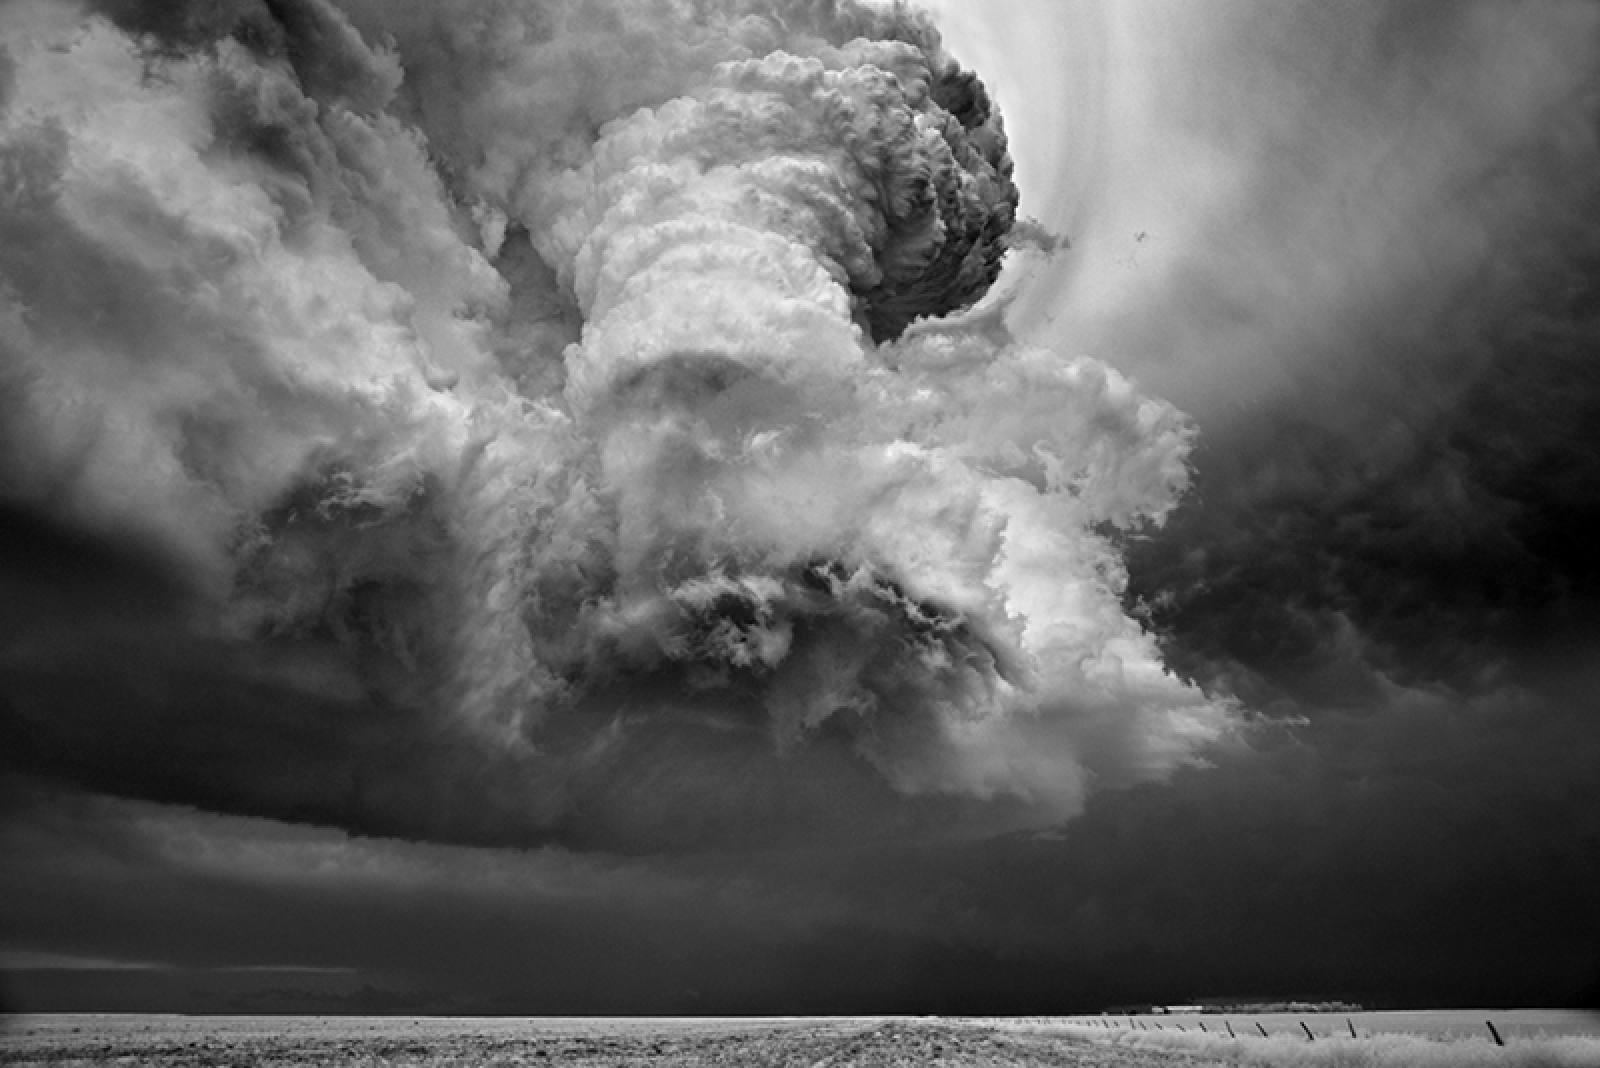 bw-storm-photography-arm-of-god